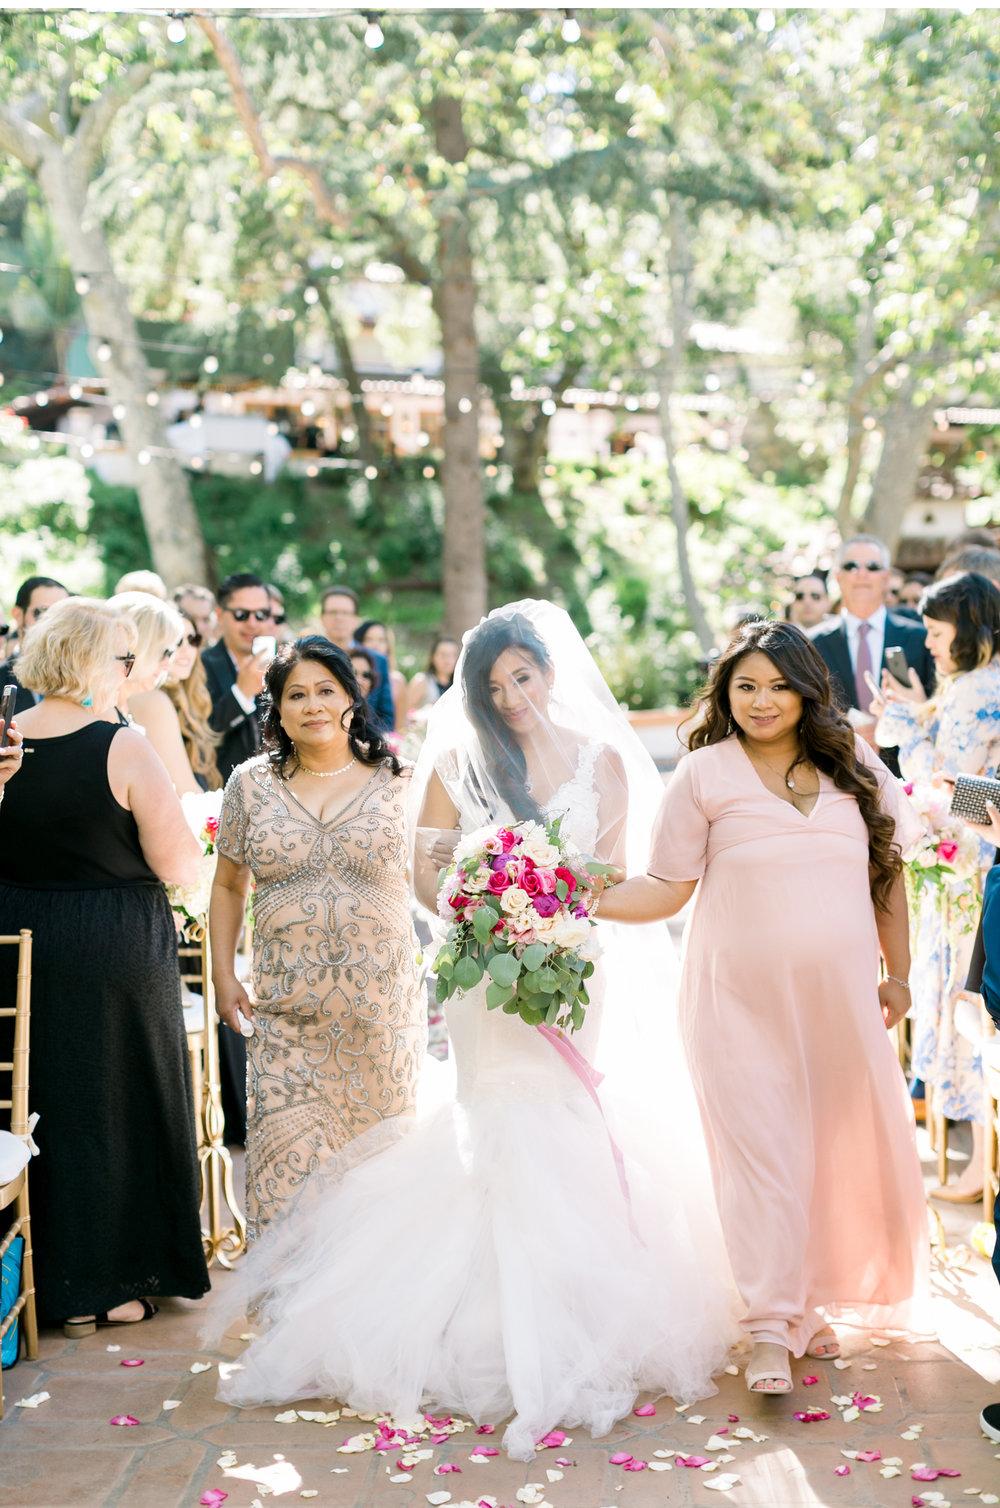 Malibu-Wedding-Triunfo-Creek-Natalie-Schutt-Photography_07.jpg